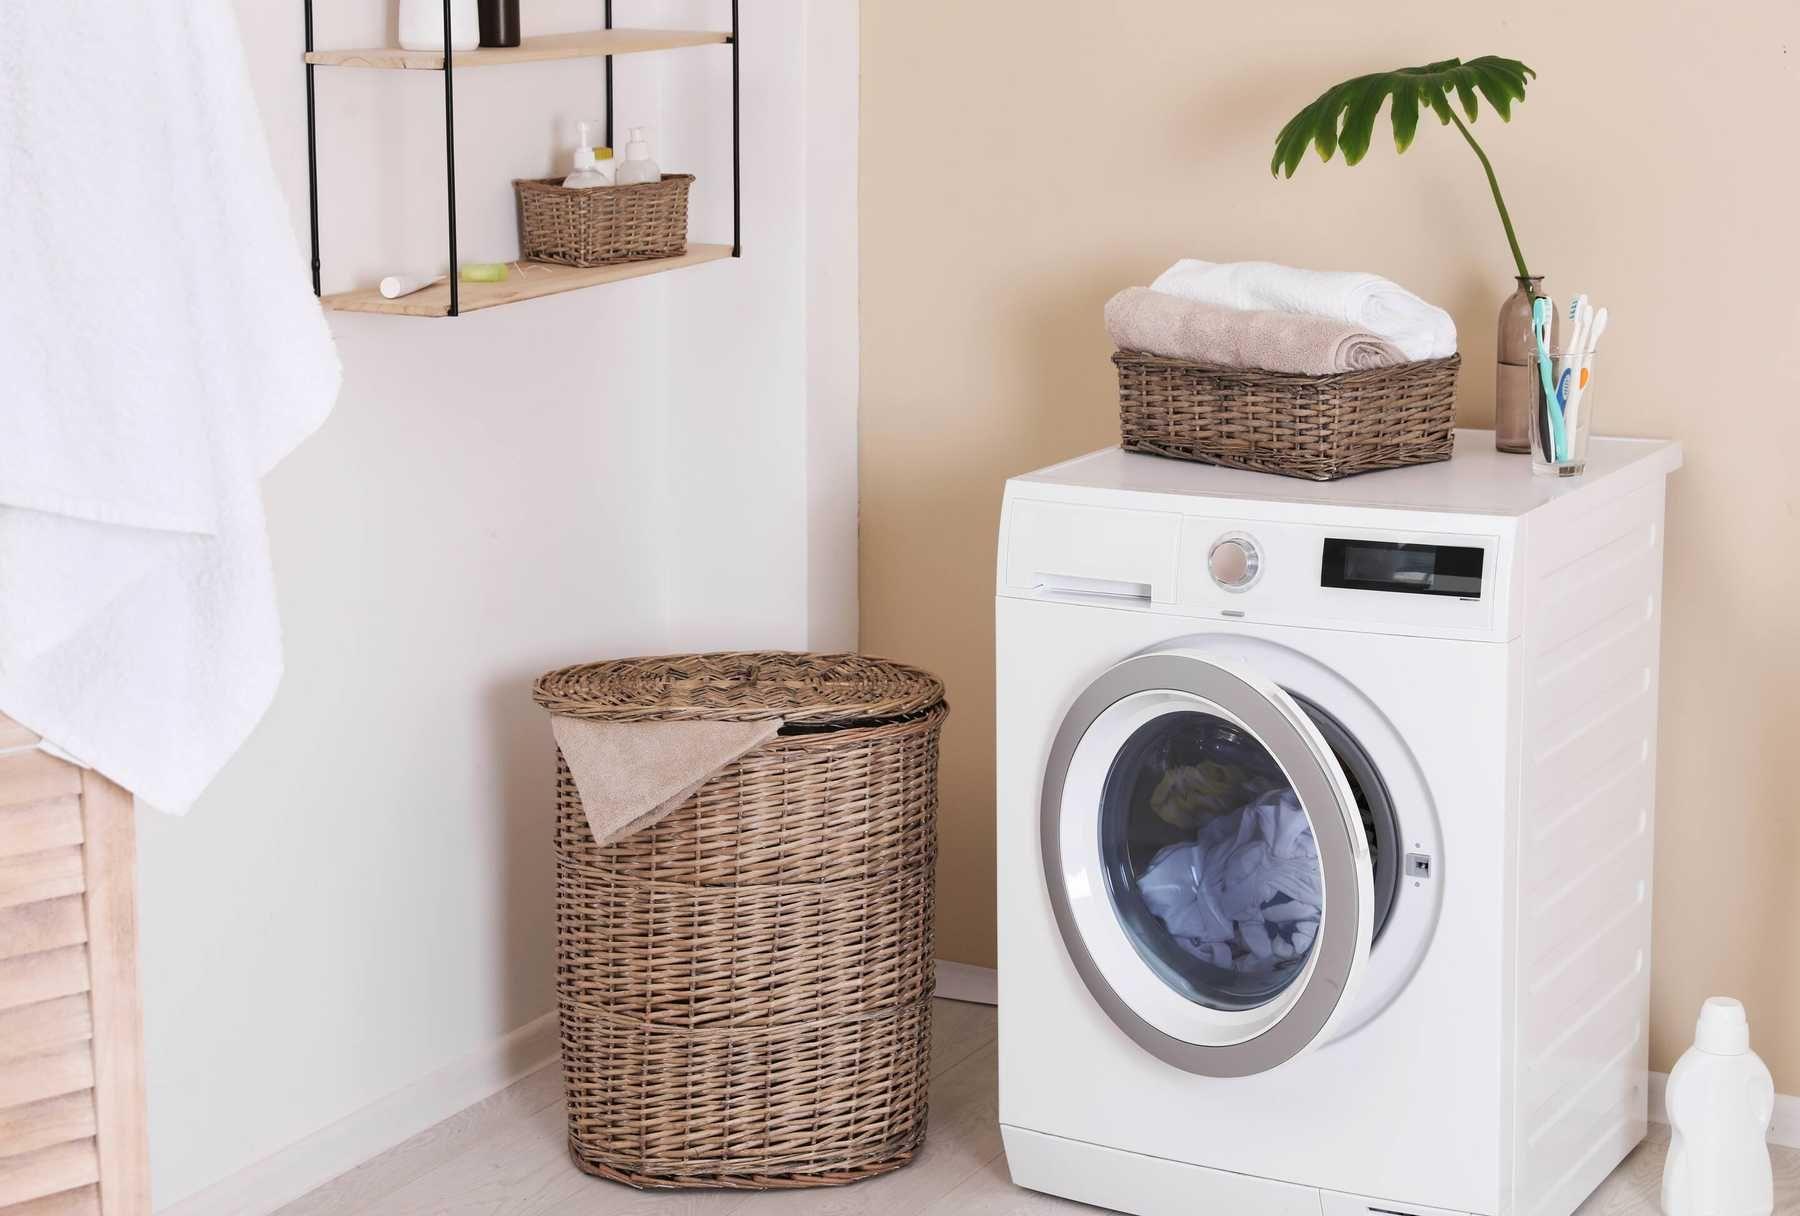 Khép hờ máy giặt cửa trước